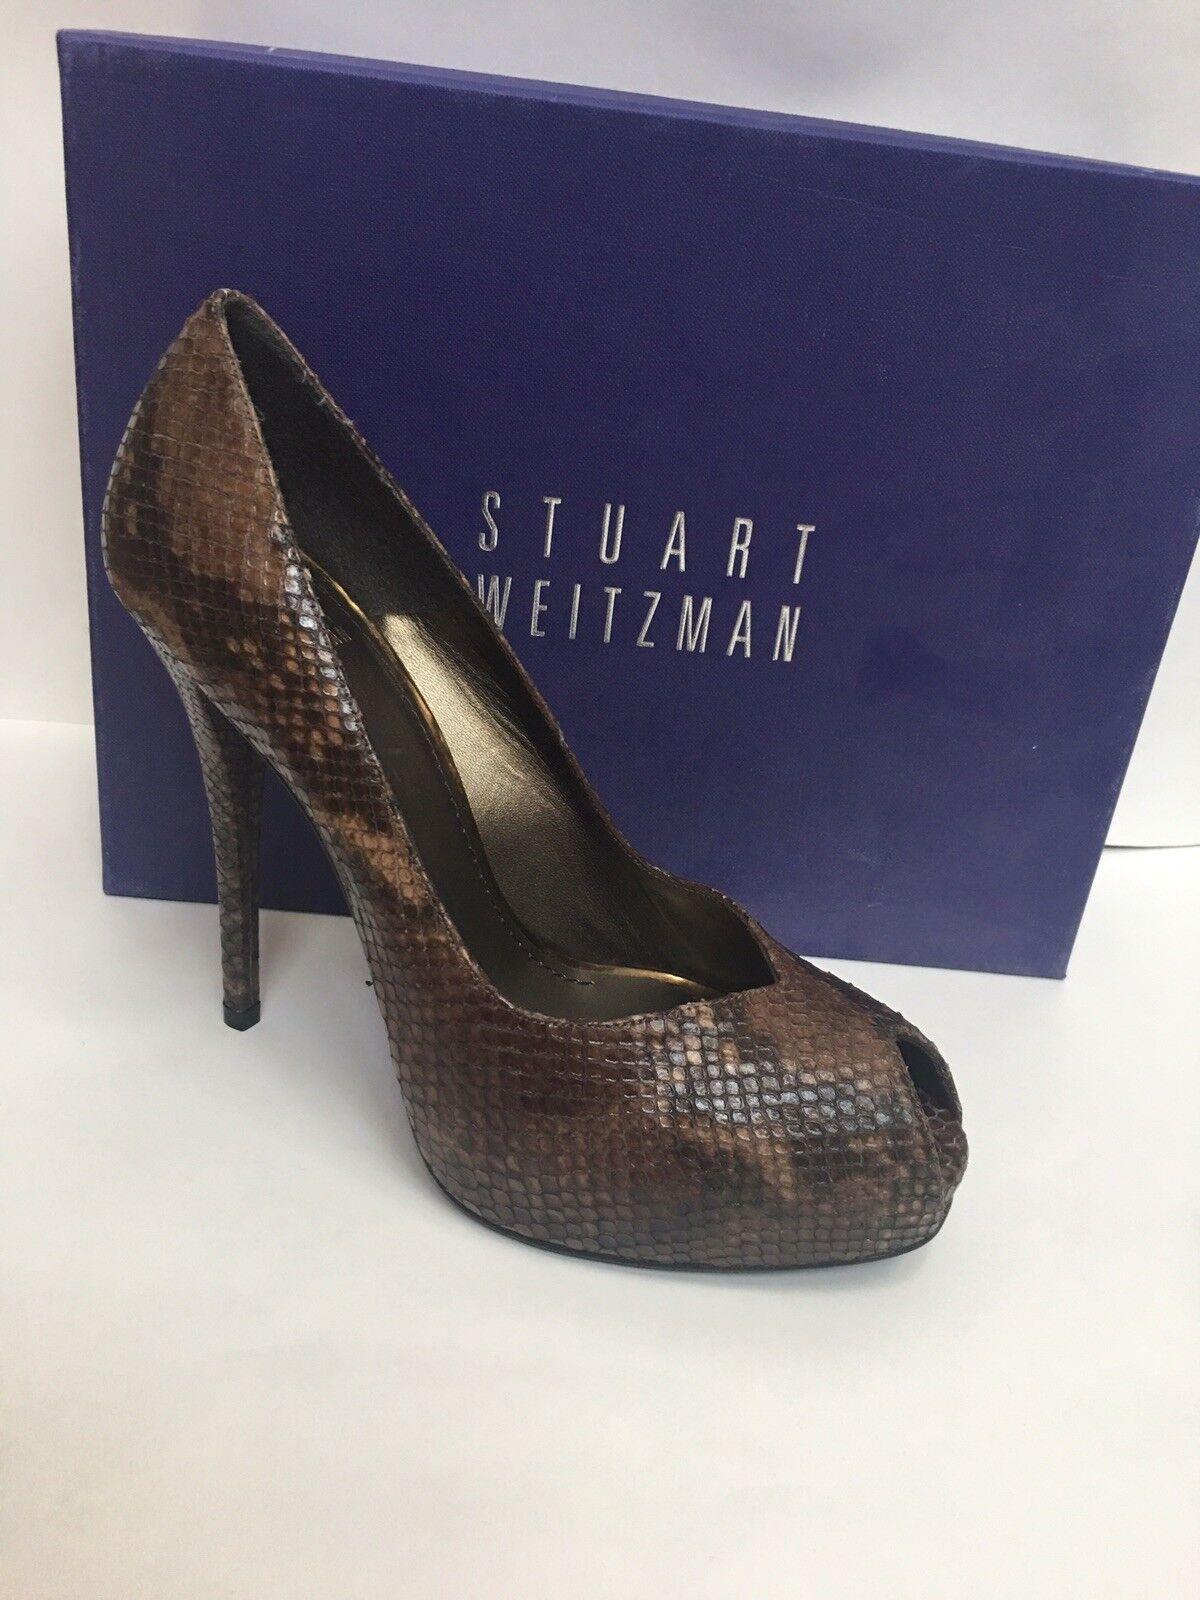 Stuart Weitzman Snakeskin peep toe hidden Platform NEW Size 9.5